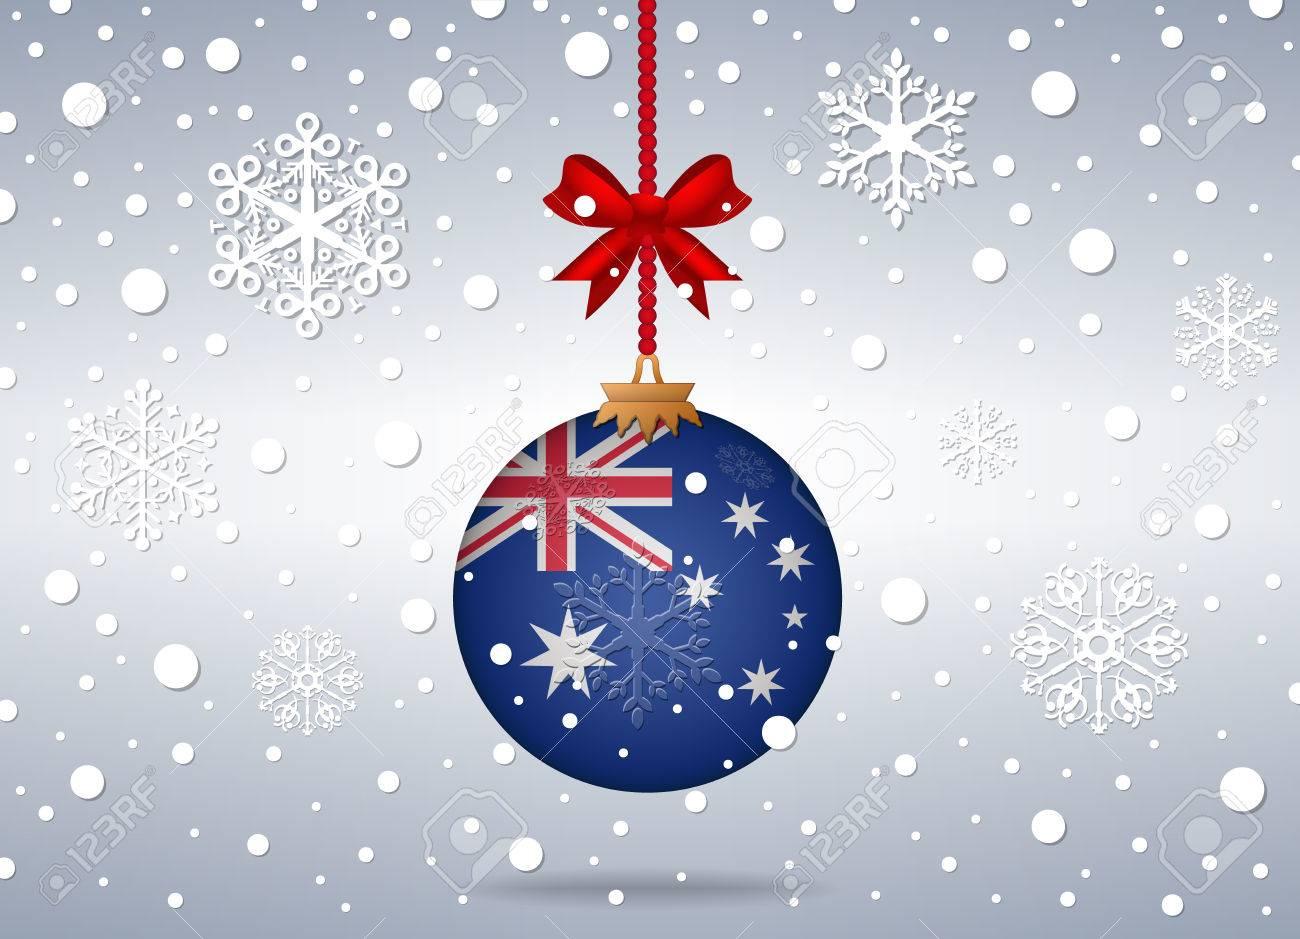 Christmas In Australia Background.Christmas Background With Australia Flag Ball